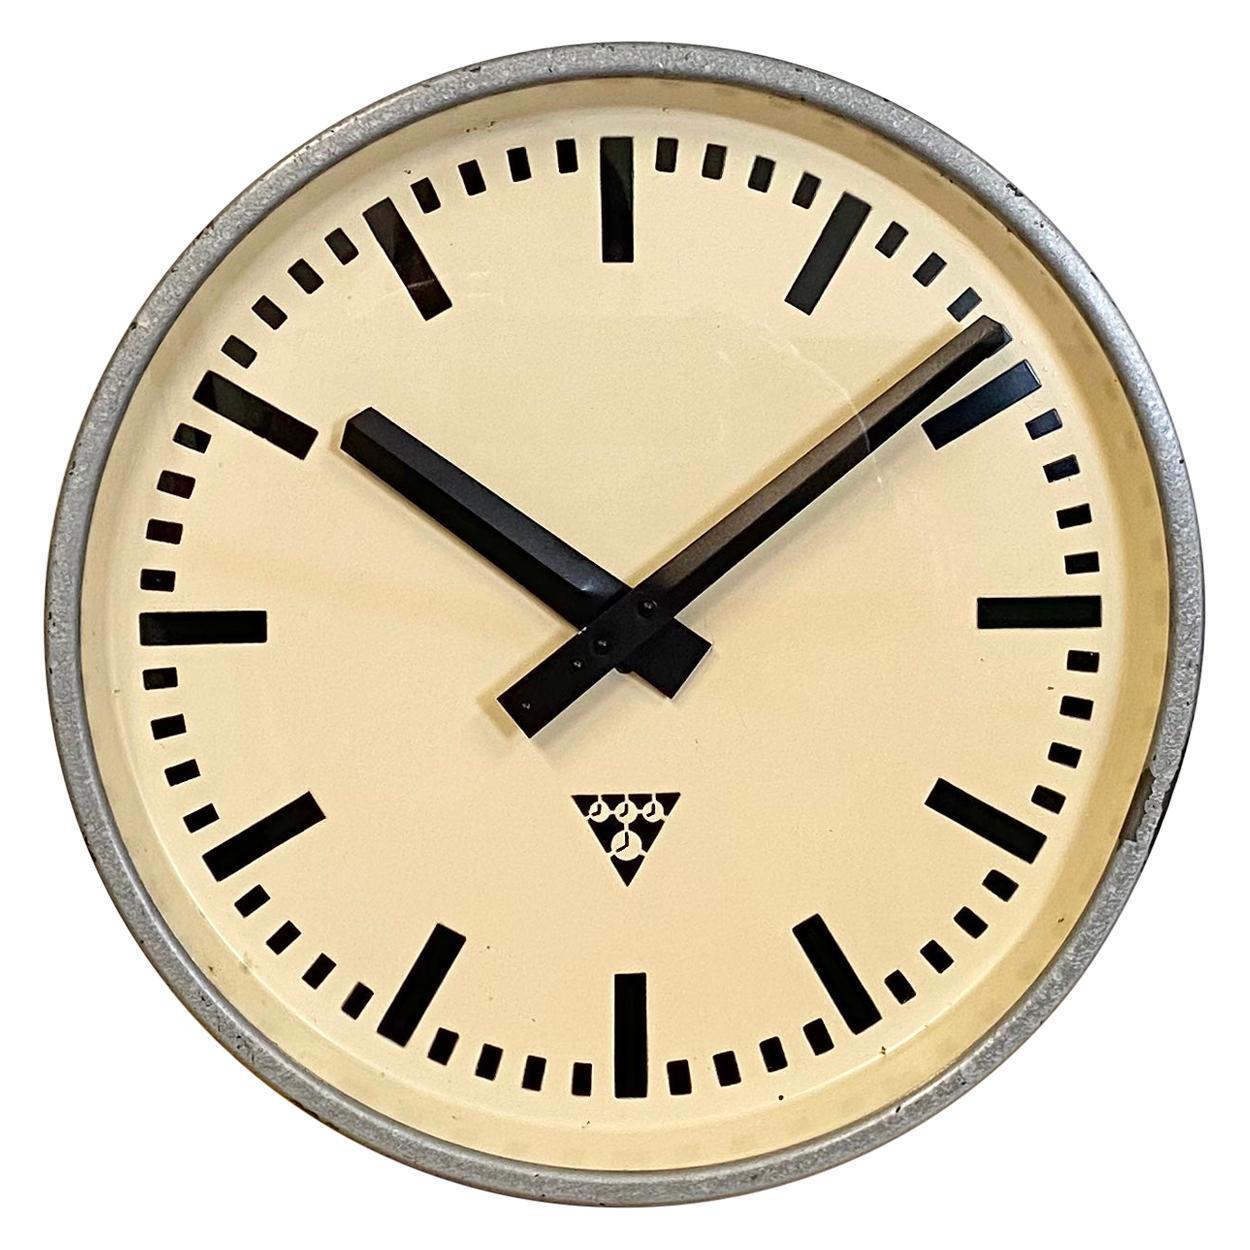 Grey Industrial Wall Clock from Pragotron, 1960s